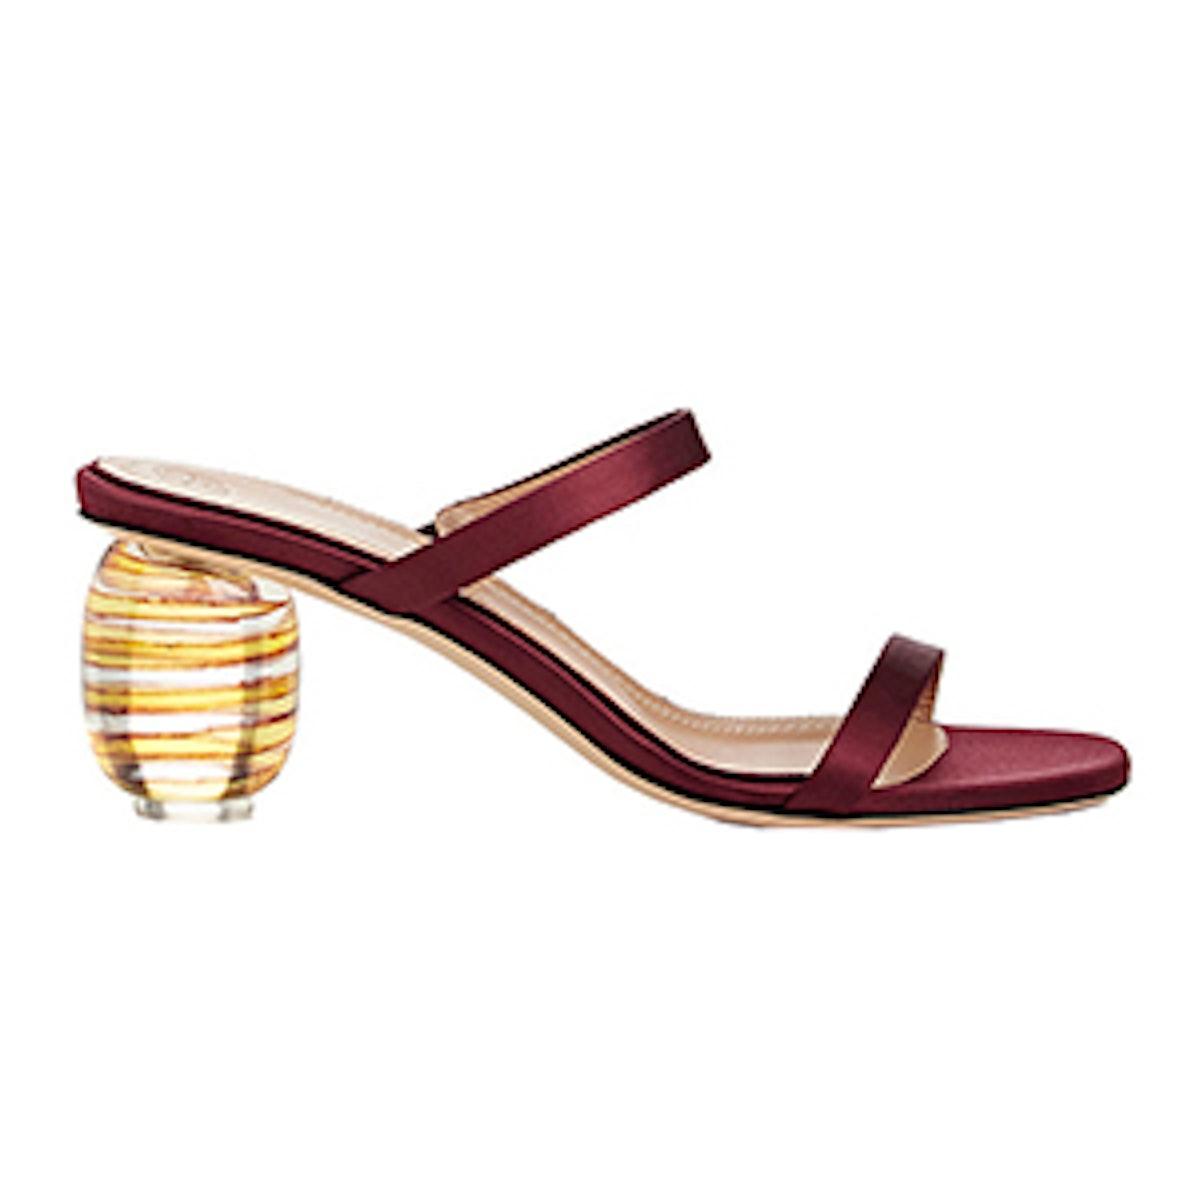 Acrylic-Glass-Heel Satin Sandals